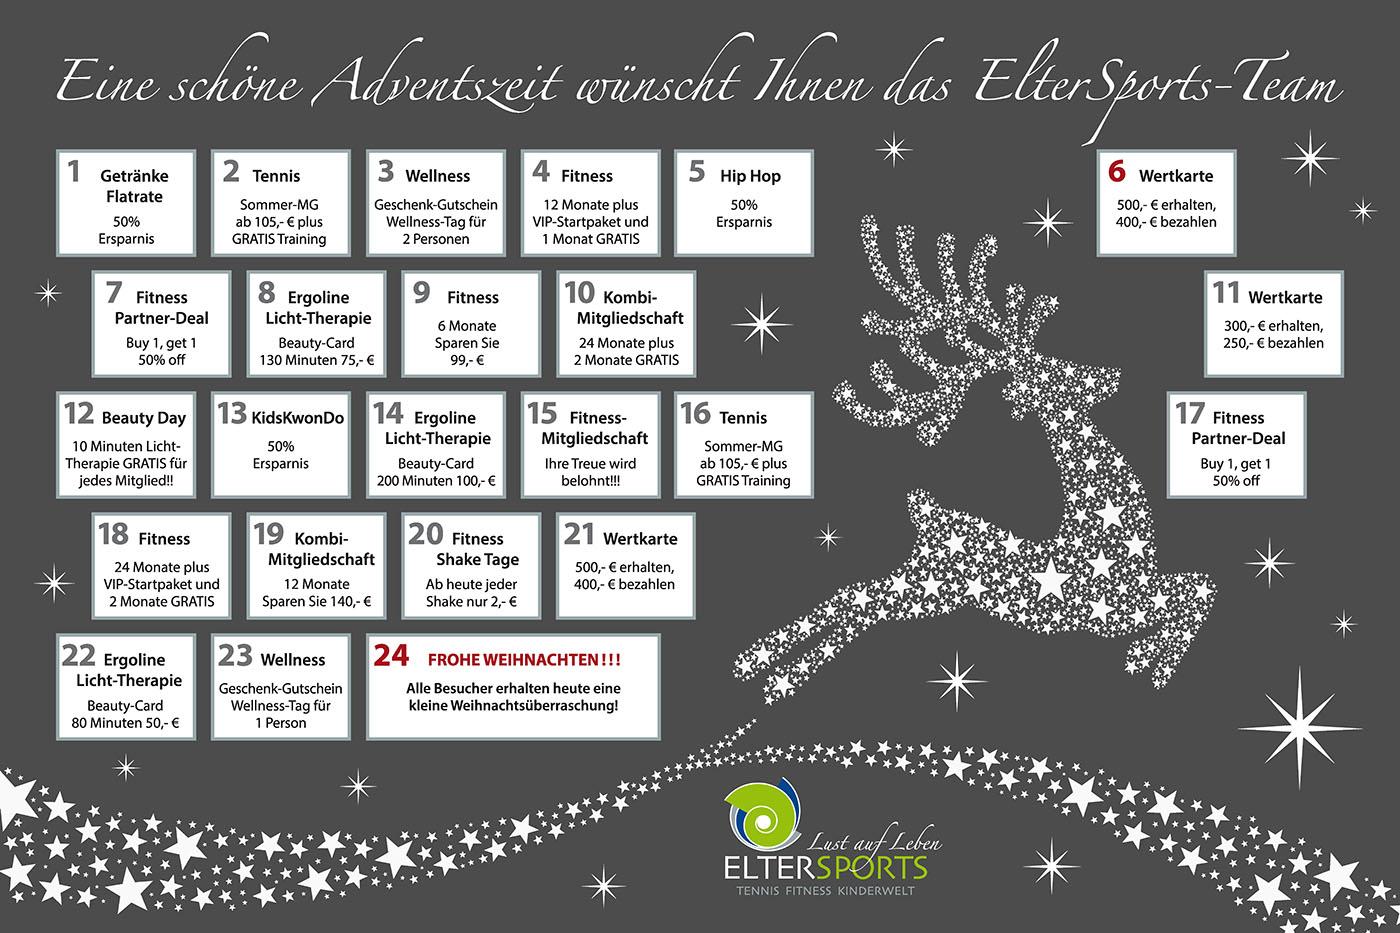 Fitness Weihnachtskalender.Eltersports Adventskalender Eltersports Die